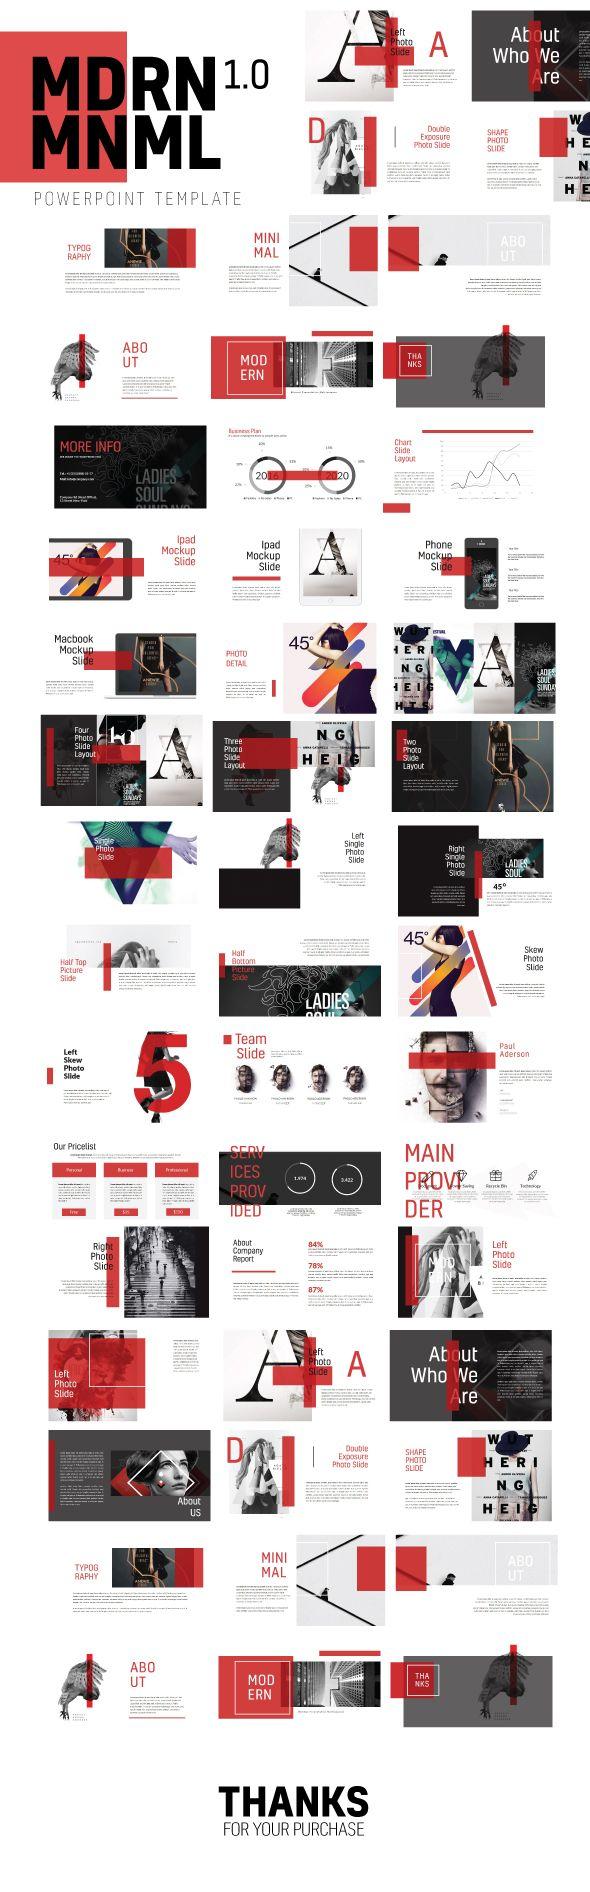 Mdrn Mnml Powerpoint Template Multipurpose - Creative PowerPoint Templates